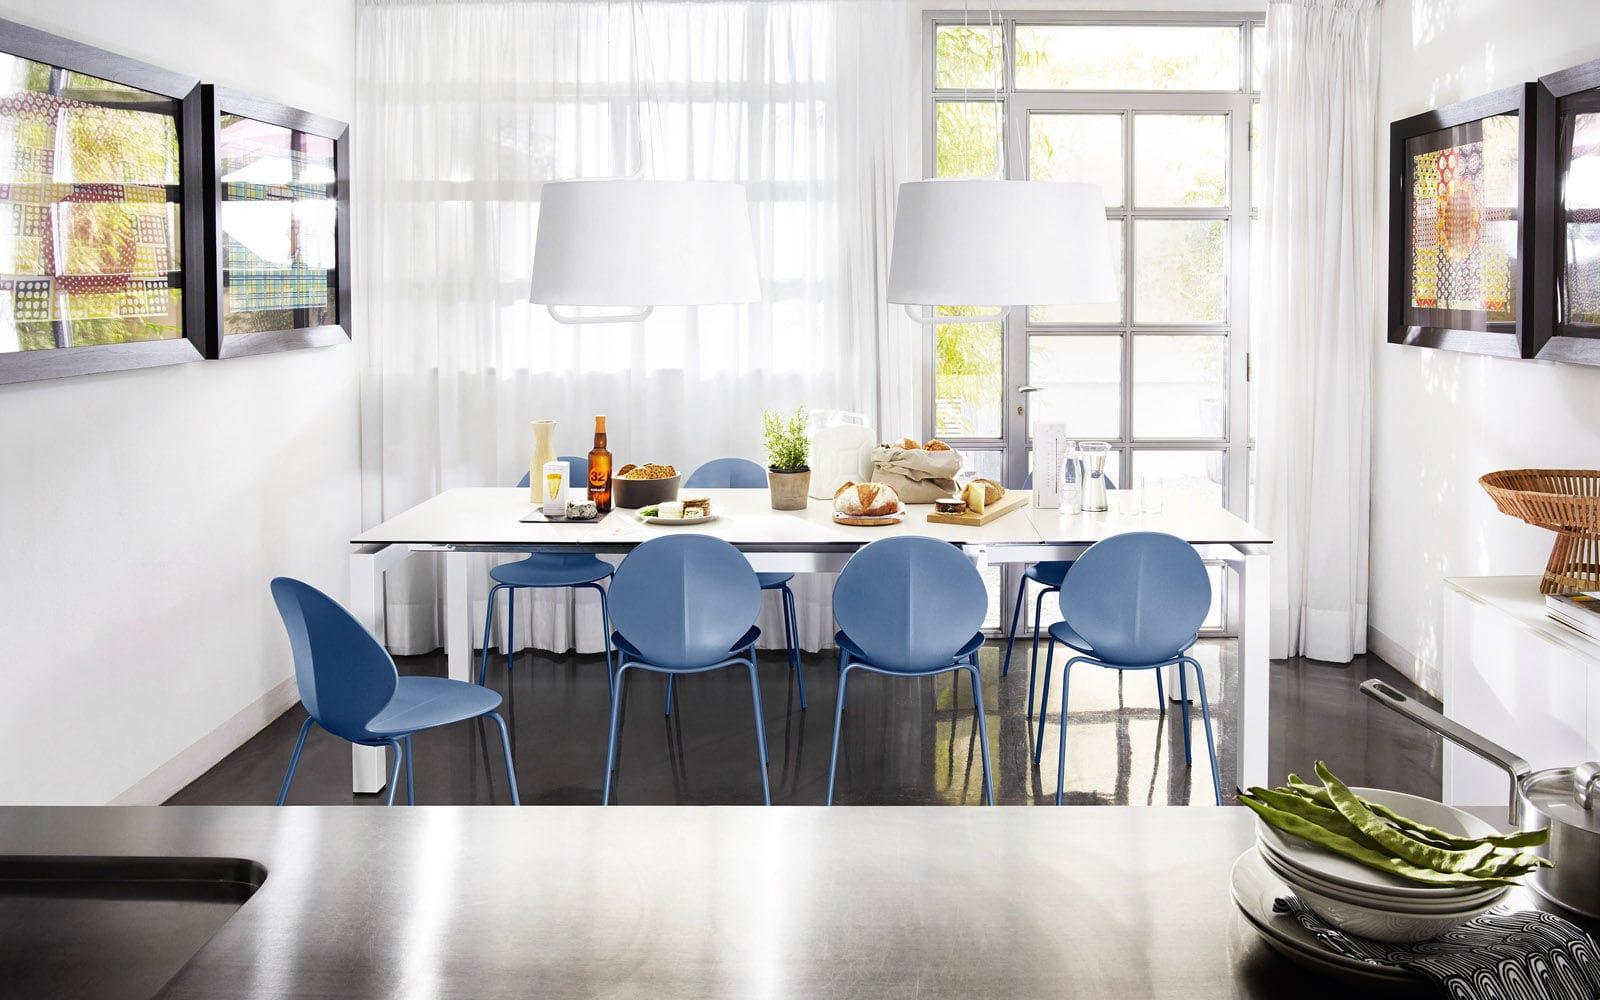 Sedia Juliet Calligaris Prezzo. Best Sedie Da Cucina Moderne Offerte ...